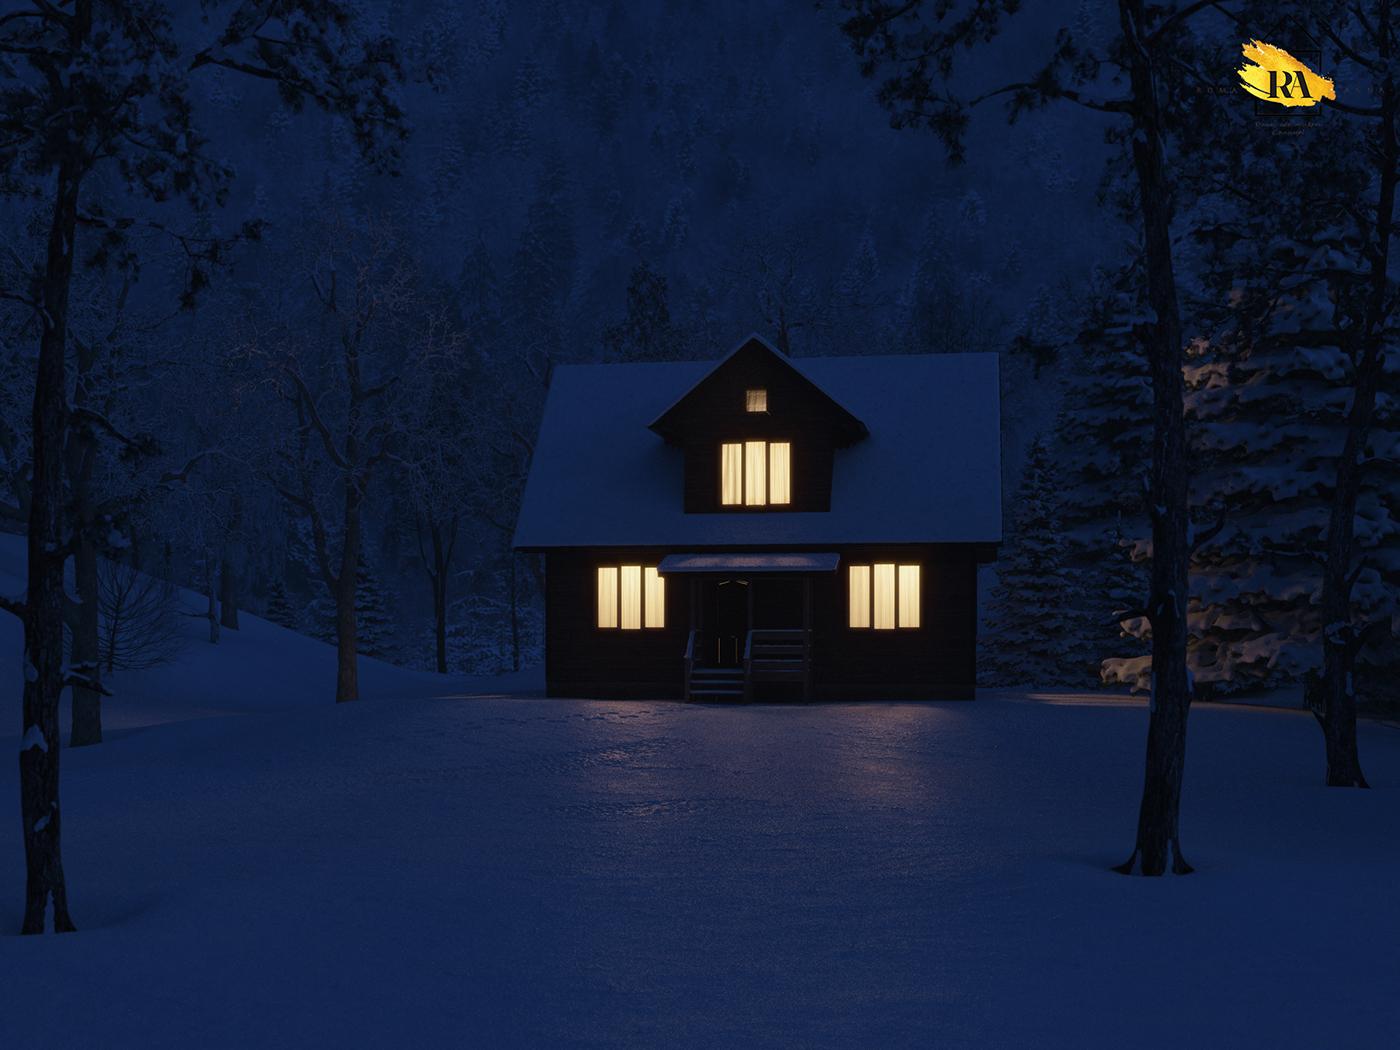 Kış ormandaki ev in 3d max corona render resim